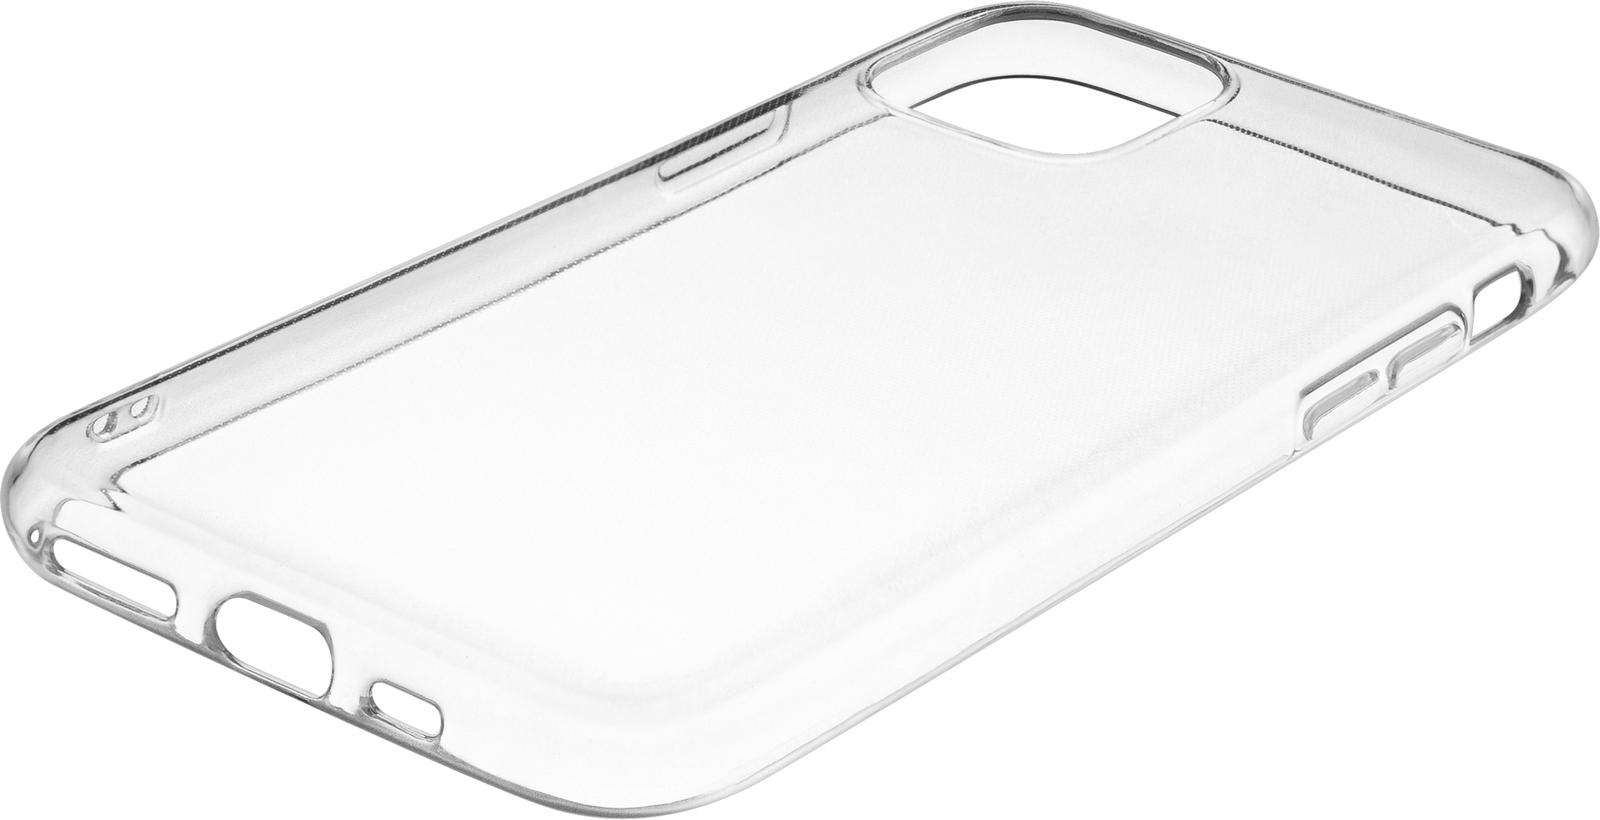 Sandberg Cover iPhone 11 Pro Soft Clear  406-59 - eet01